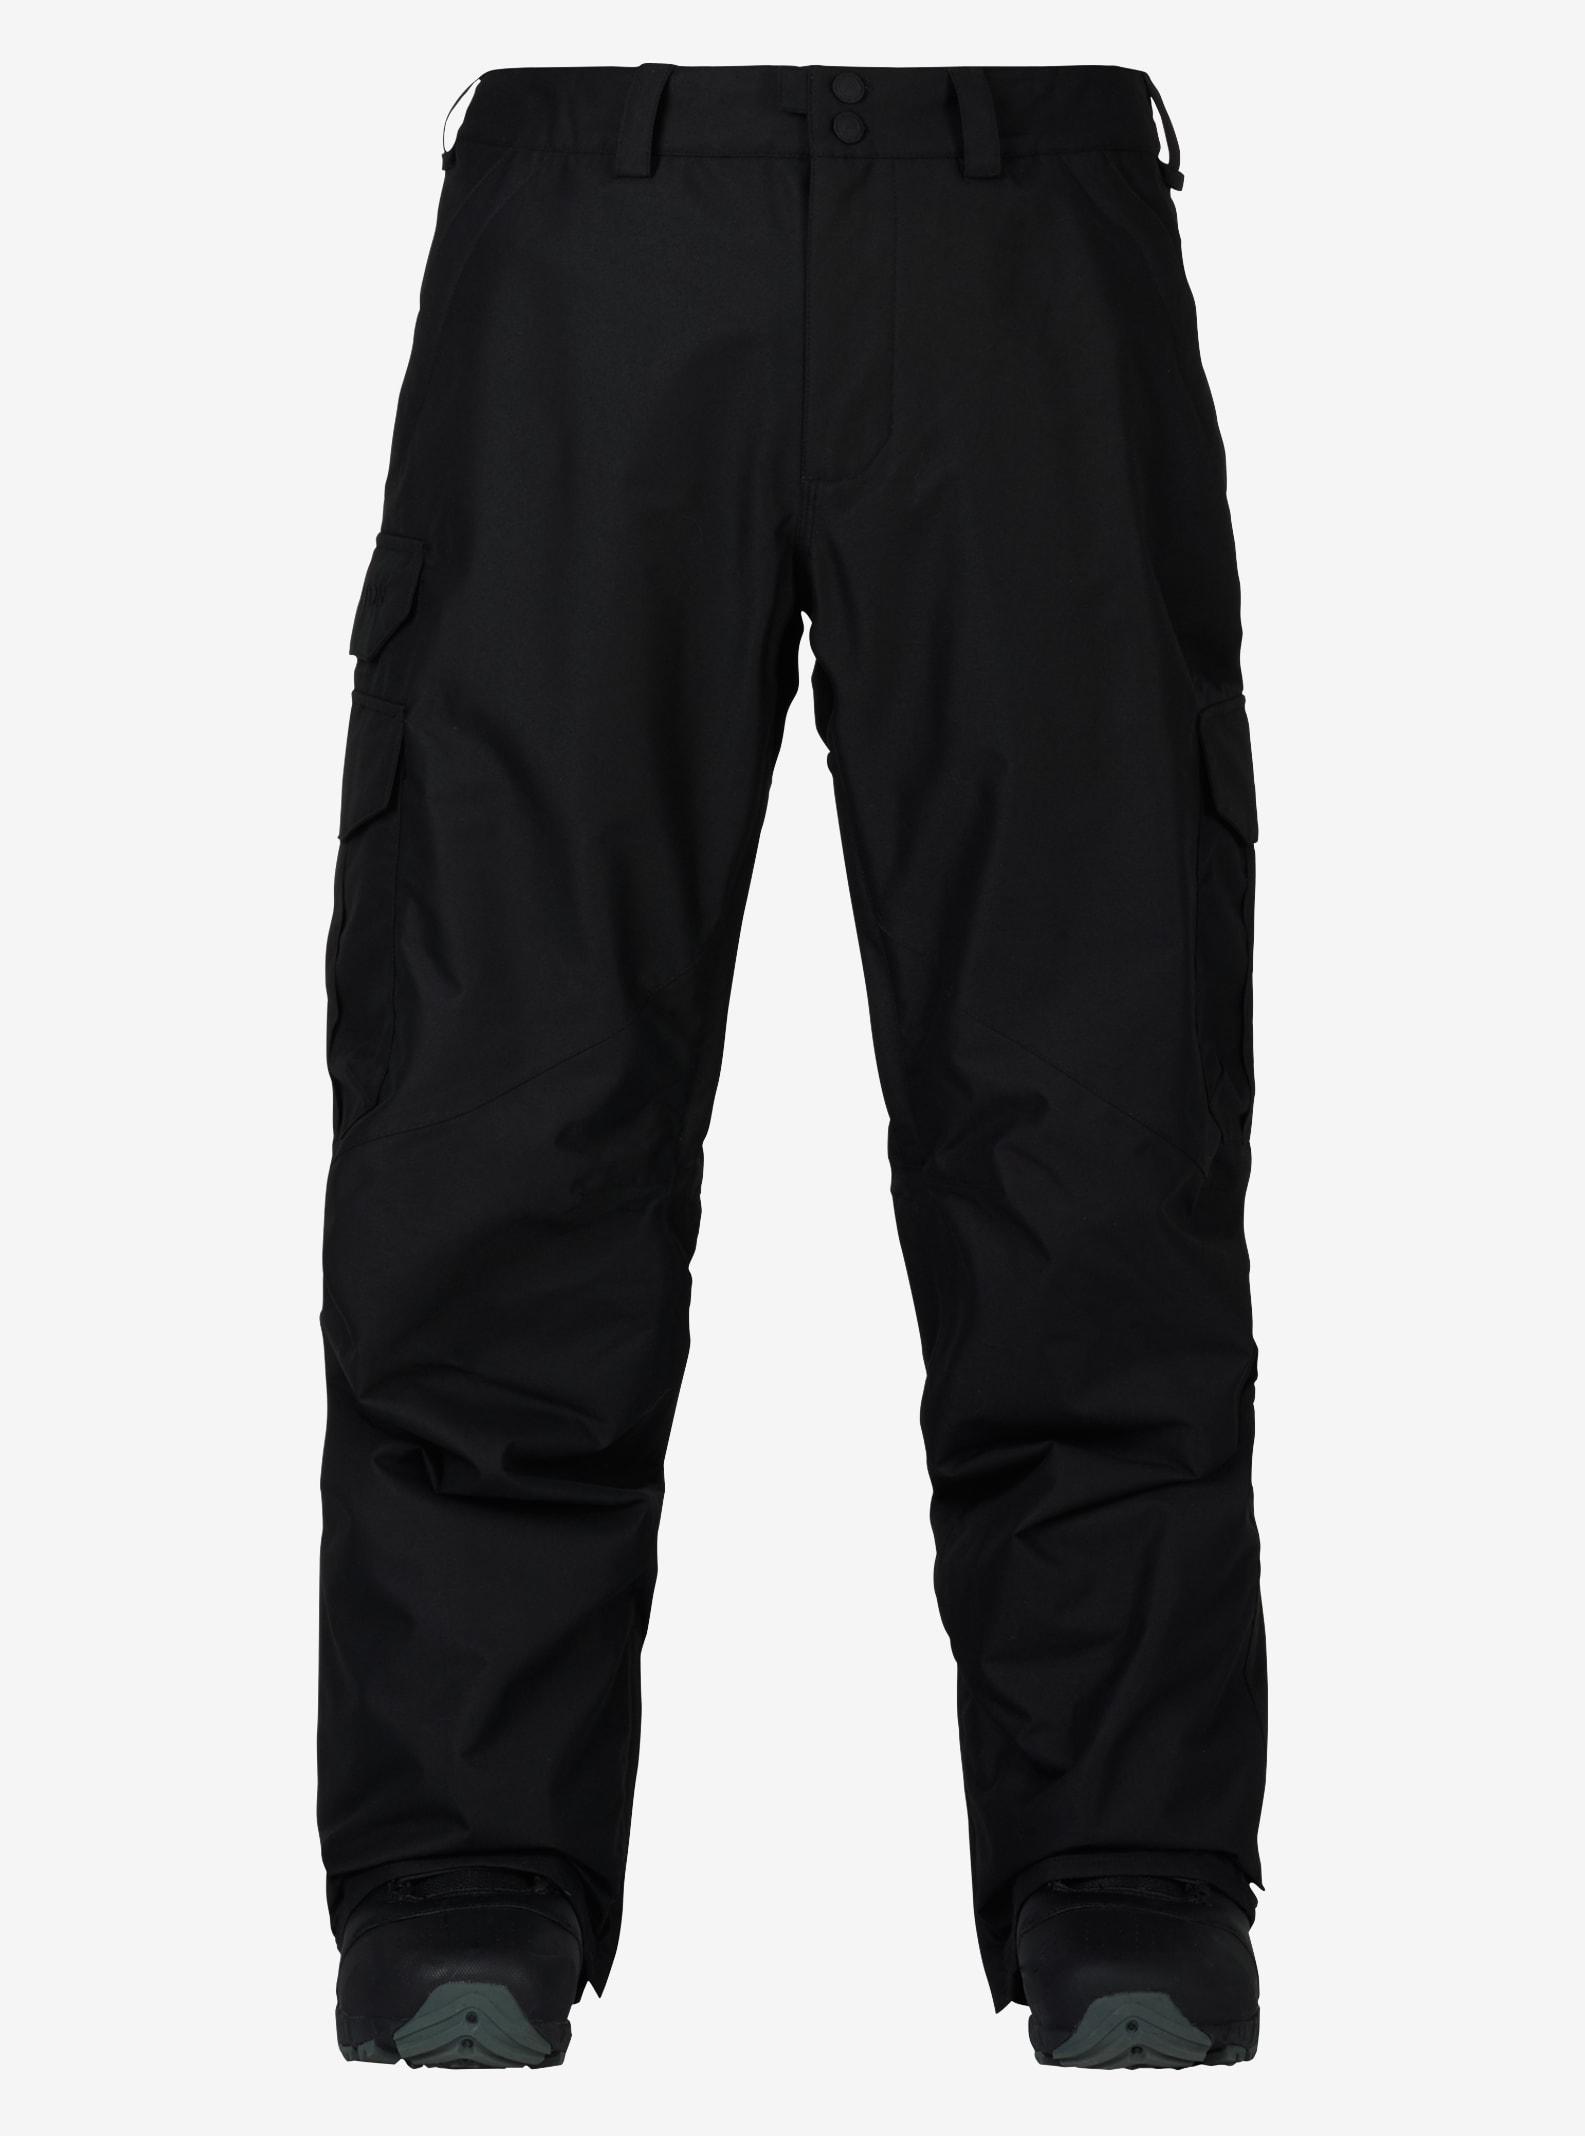 Men's Burton Cargo Pant - Tall shown in True Black